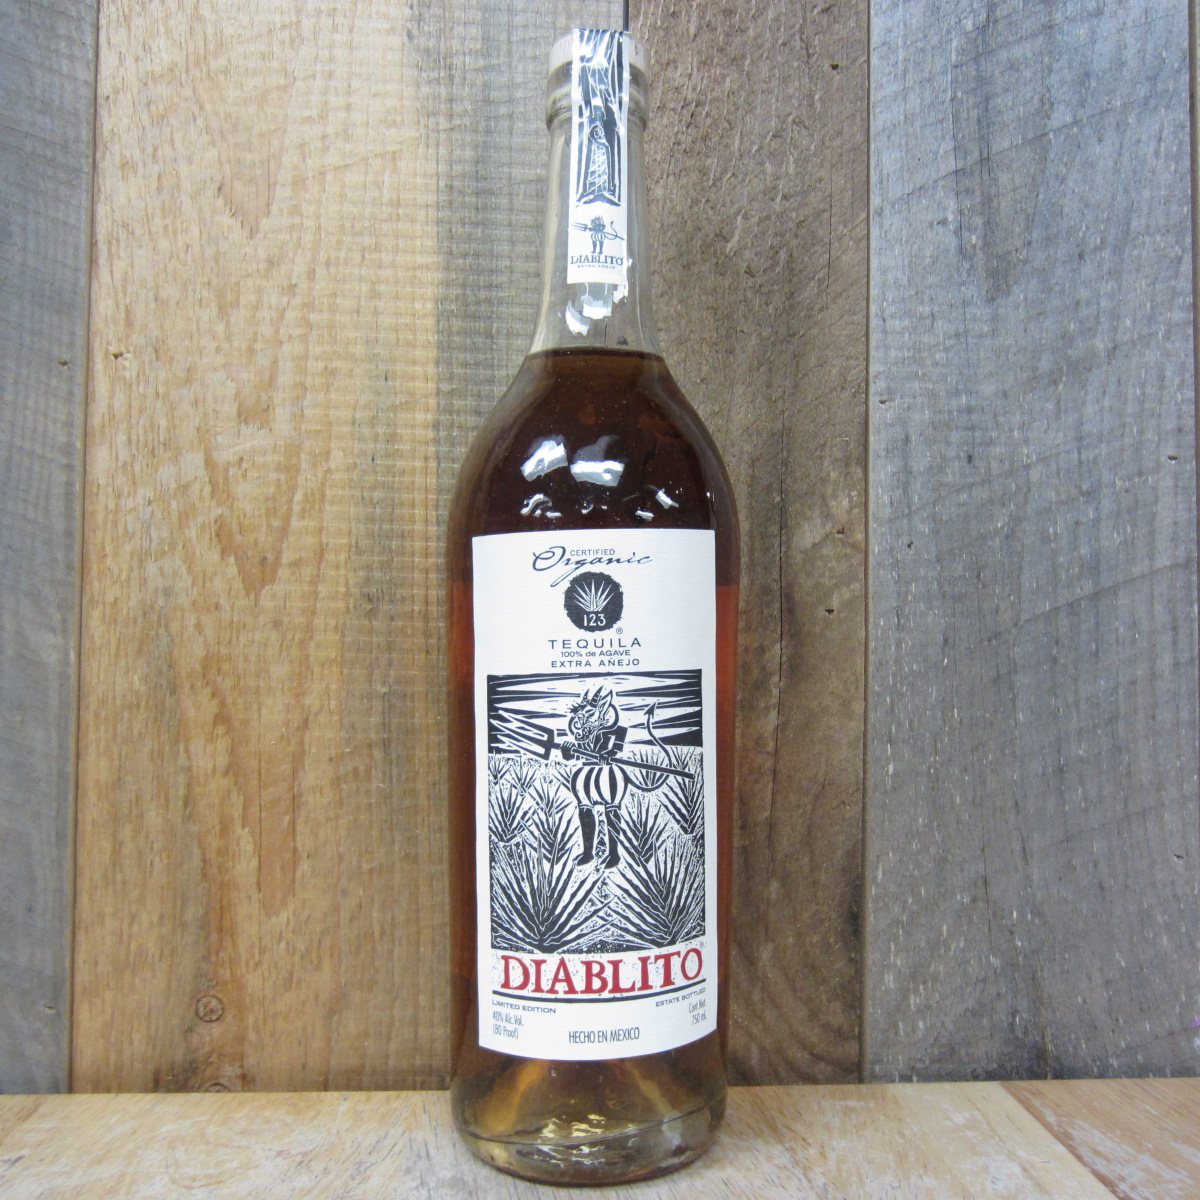 123 Diablito Extra Anejo Organic Tequila 750ml